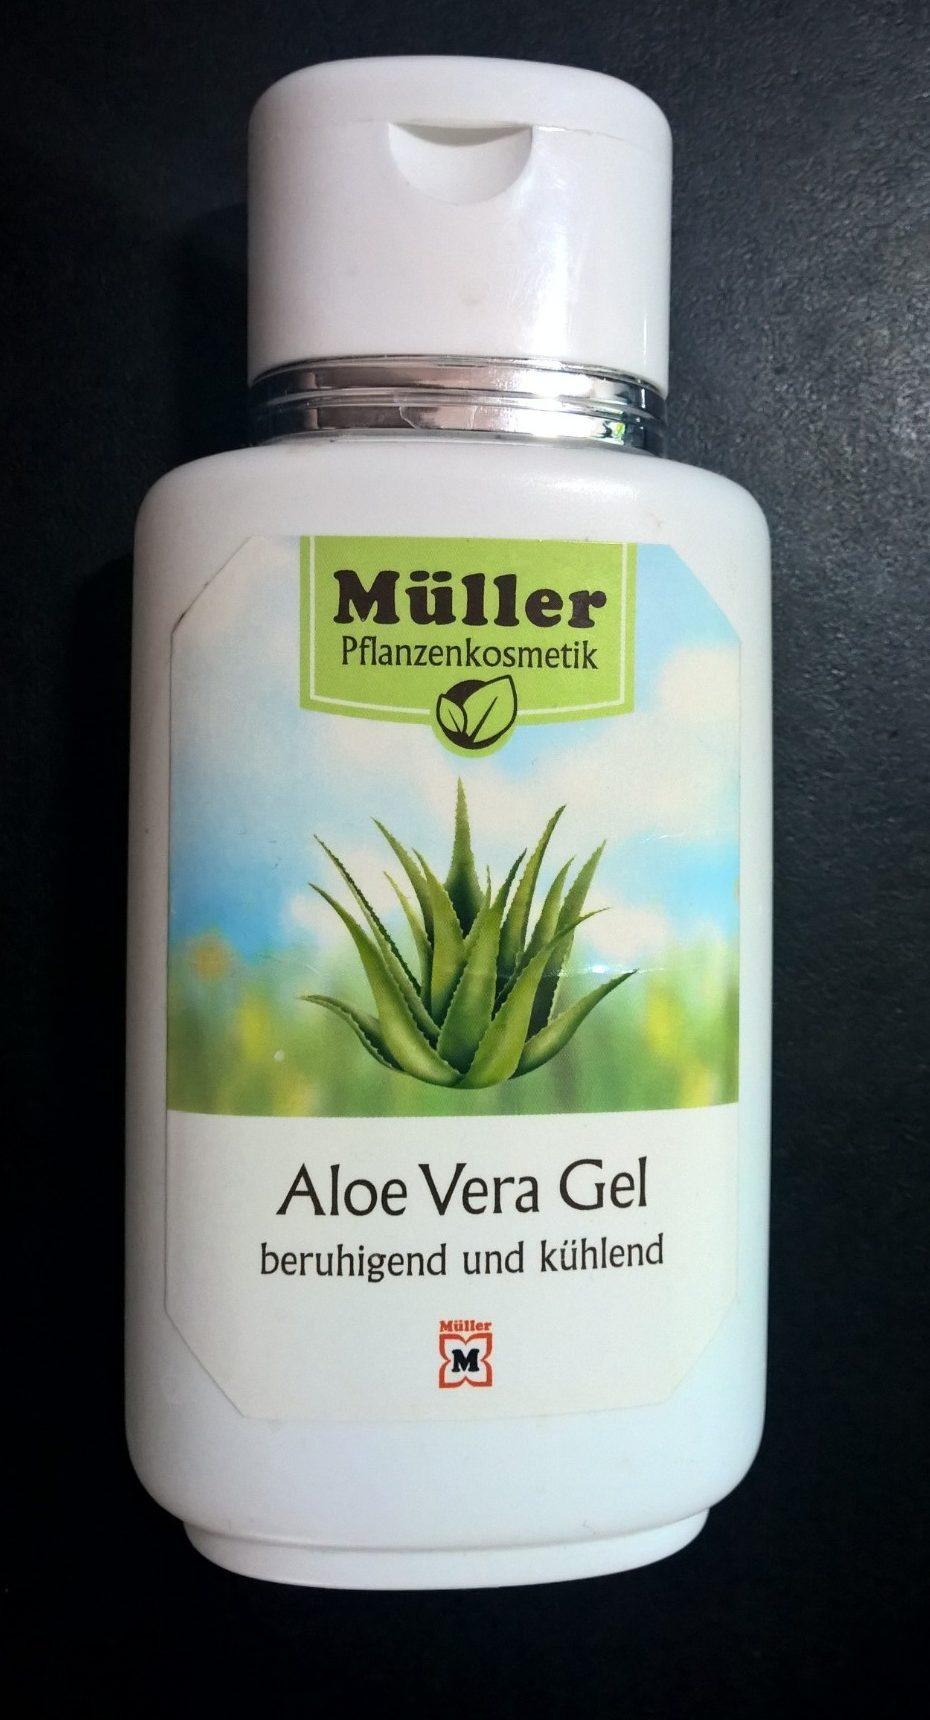 Aloe Vera Gel - Product